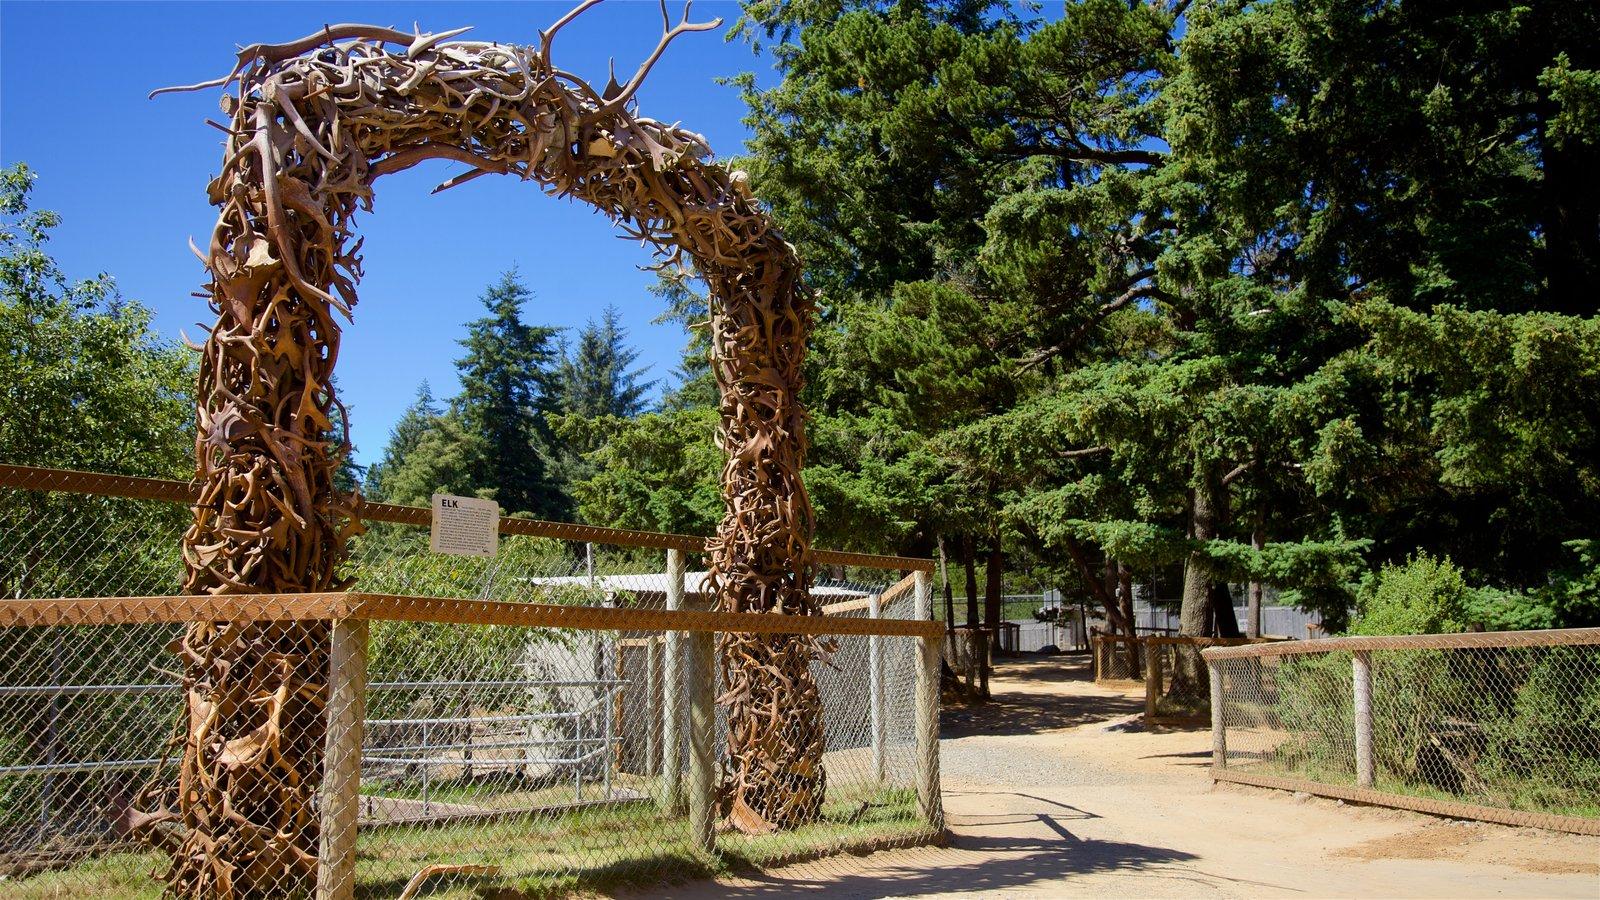 West Coast Game Park Safari caracterizando um jardim